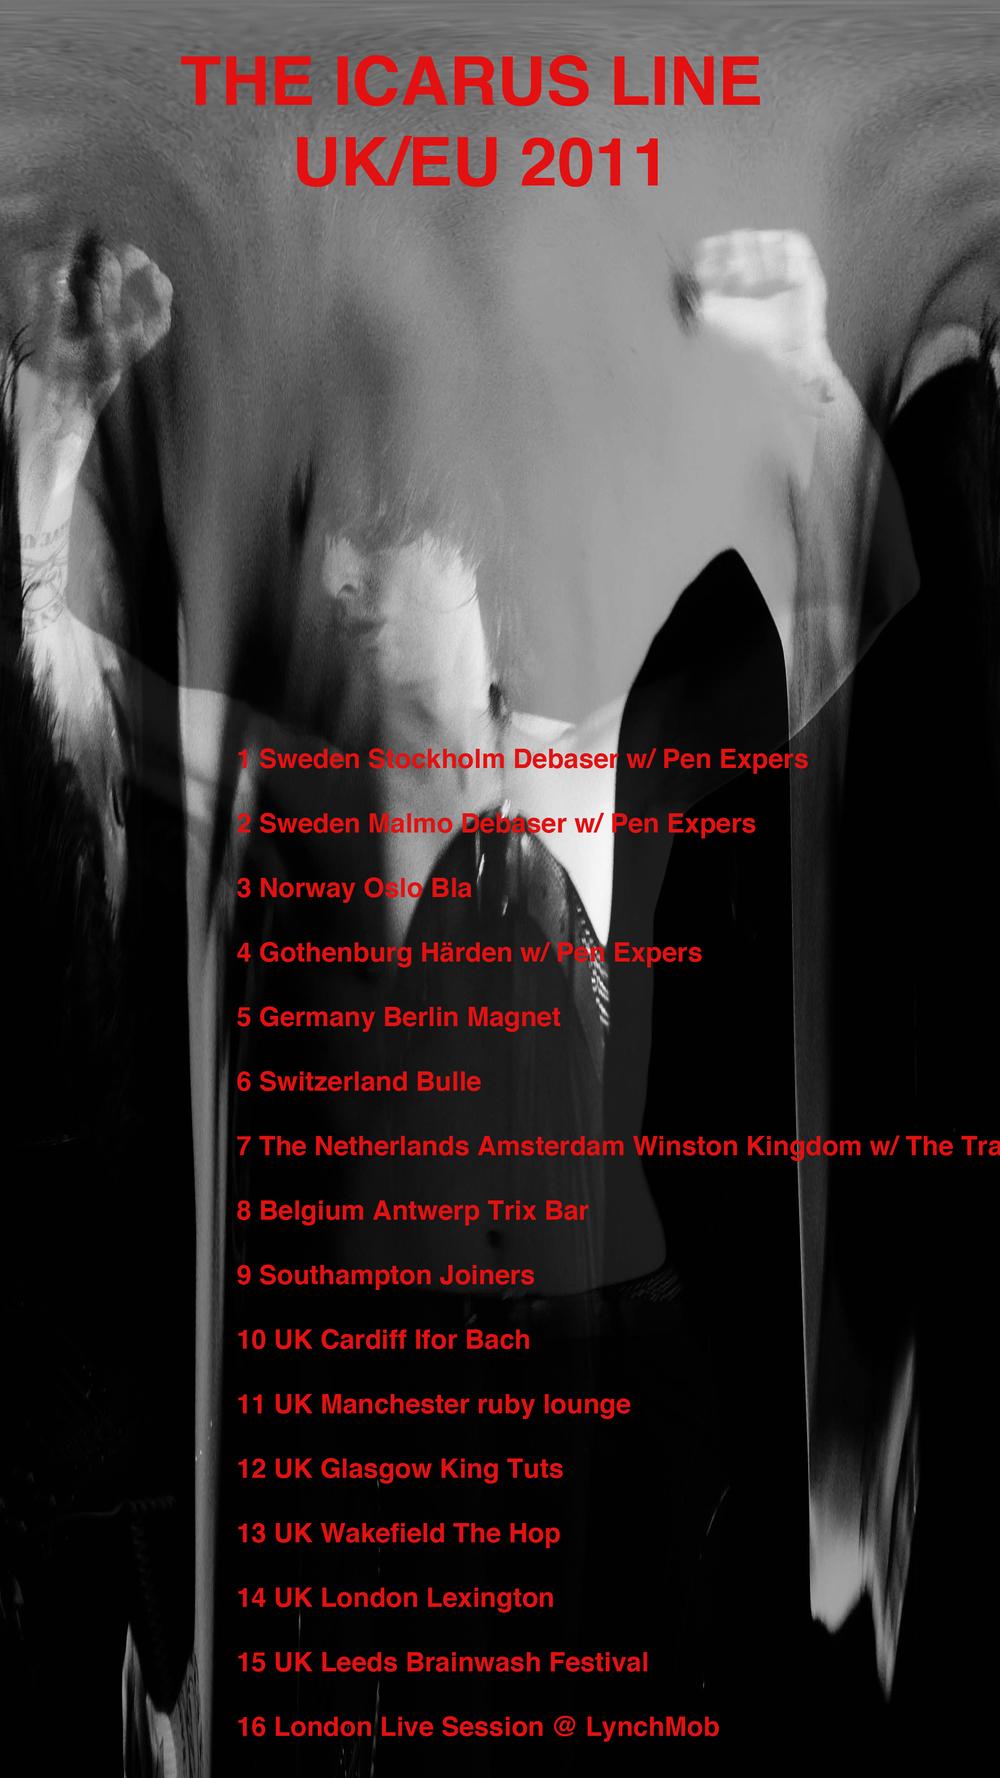 THE ICARUS LINE UK/EU TOUR DATES OCTOBER 2011